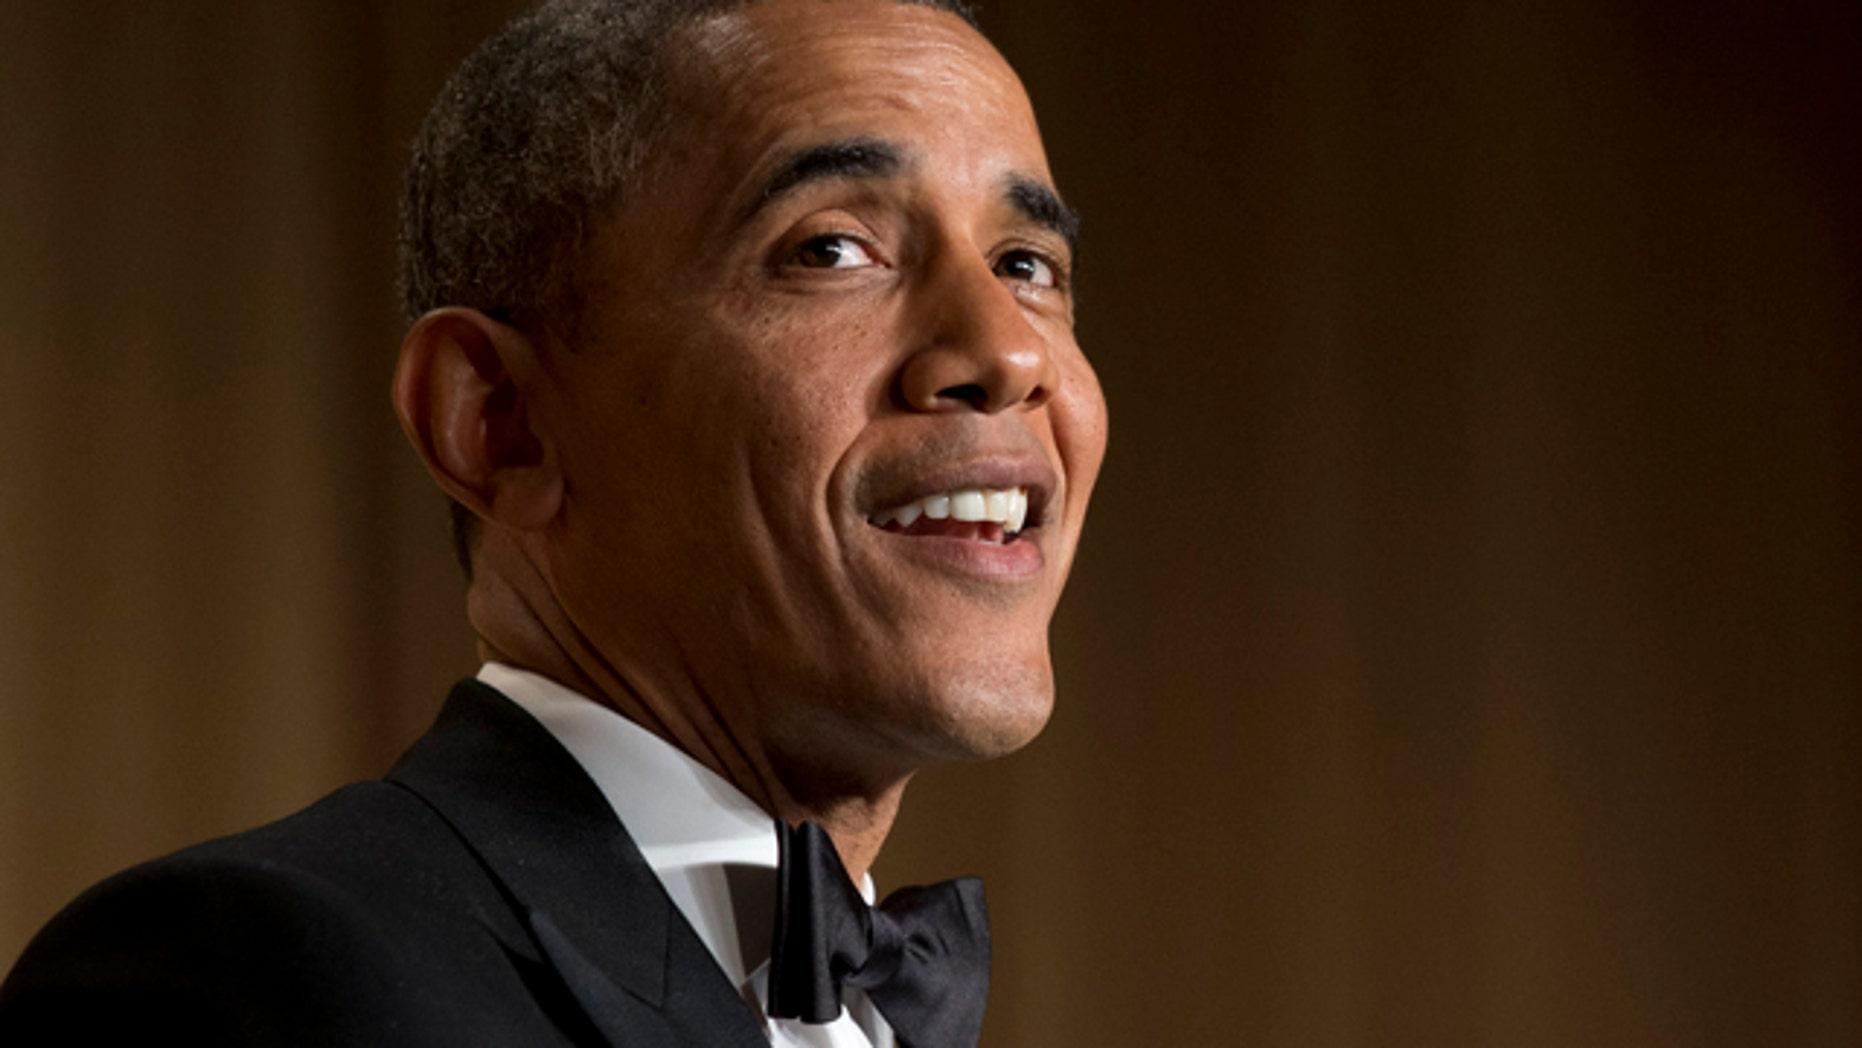 President Obama speaks during the White House Correspondents Association Dinner at the Washington Hilton Hotel.